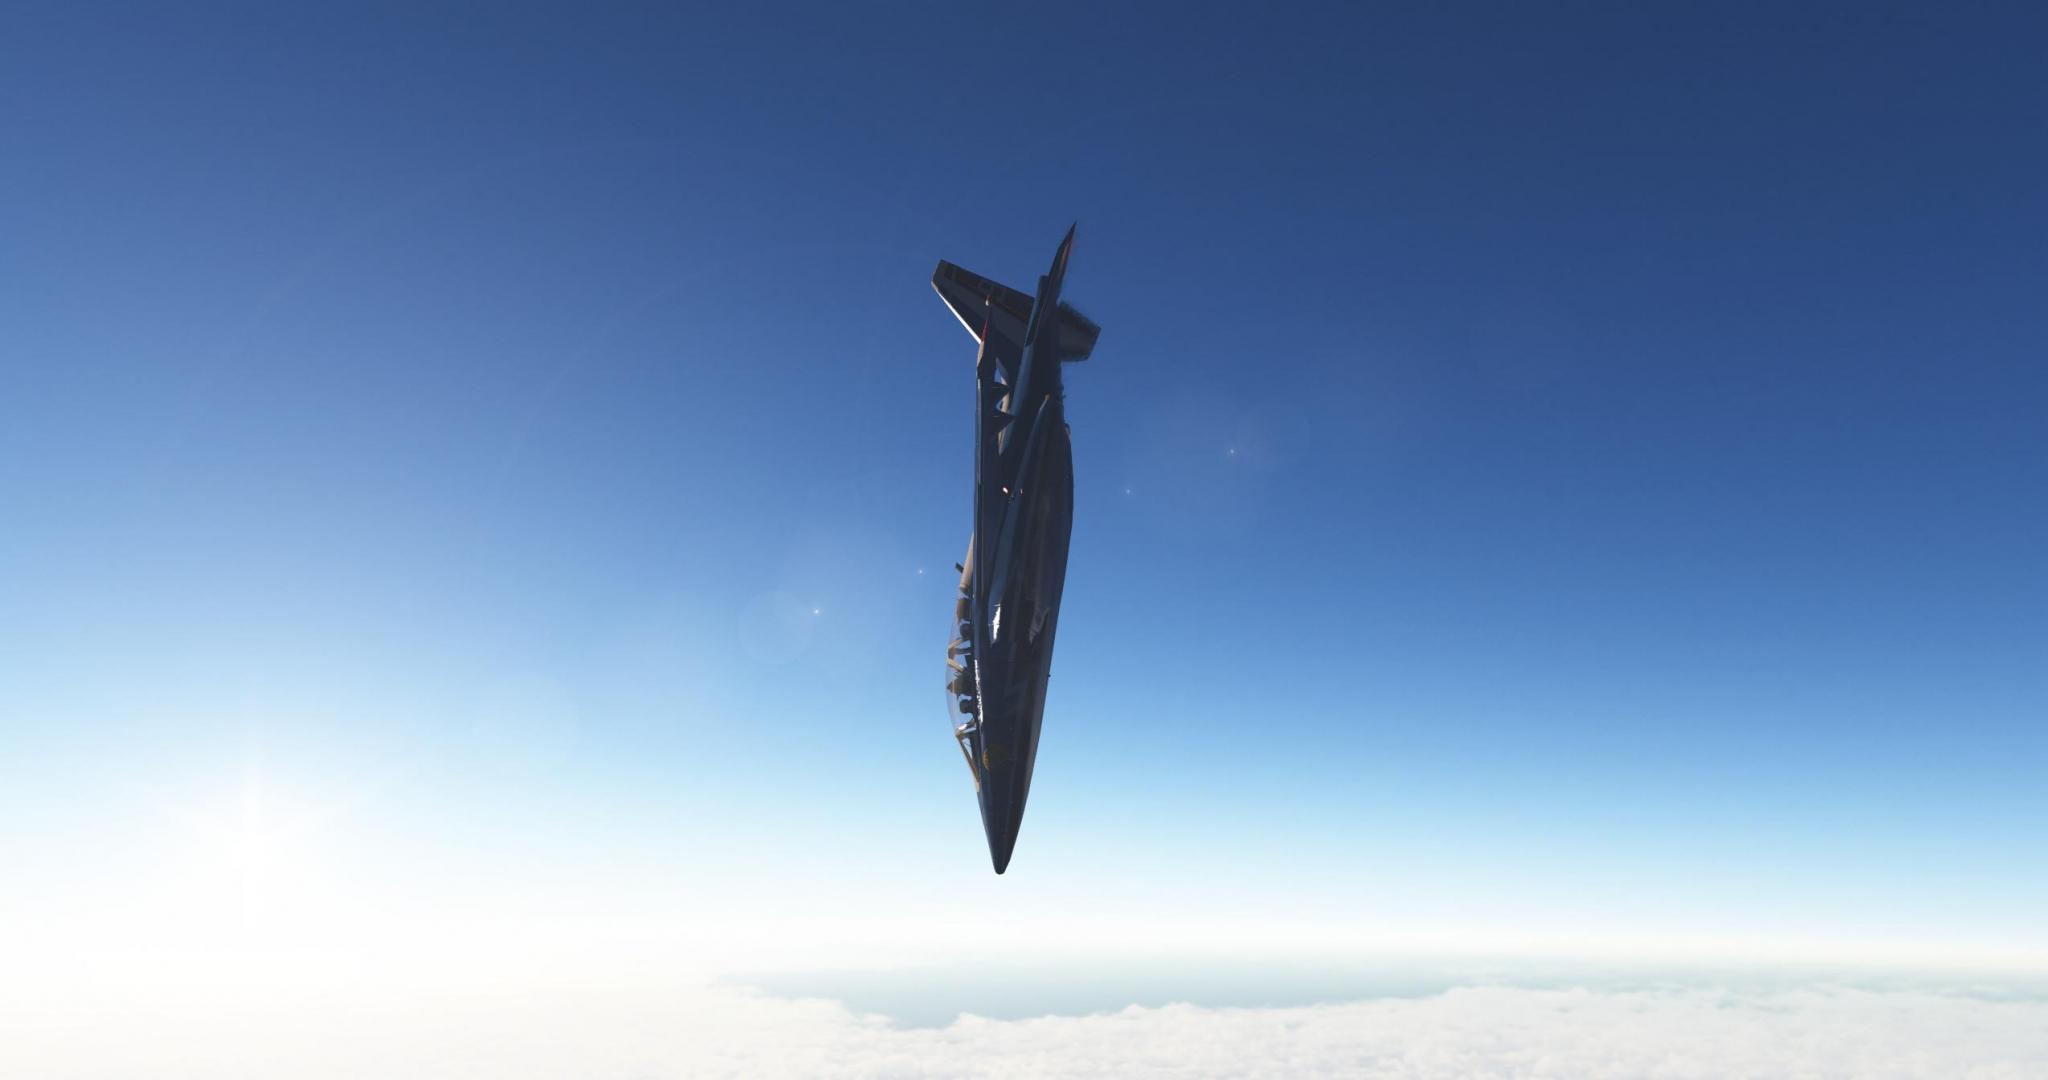 zfh9F2b.jpg